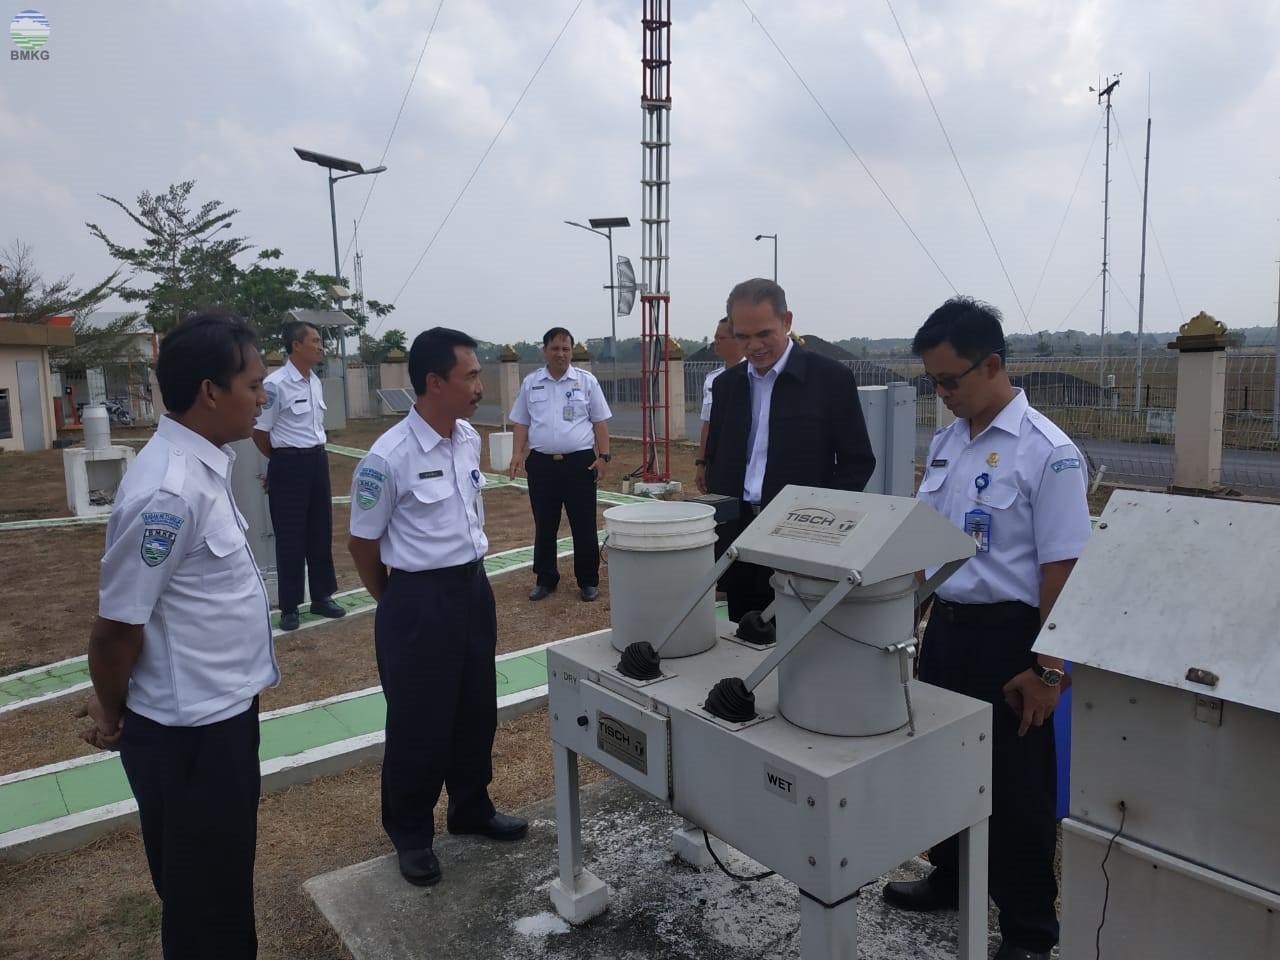 Kunjungan Kerja Deputi Bidang Klimatologi ke Provinsi Lampung